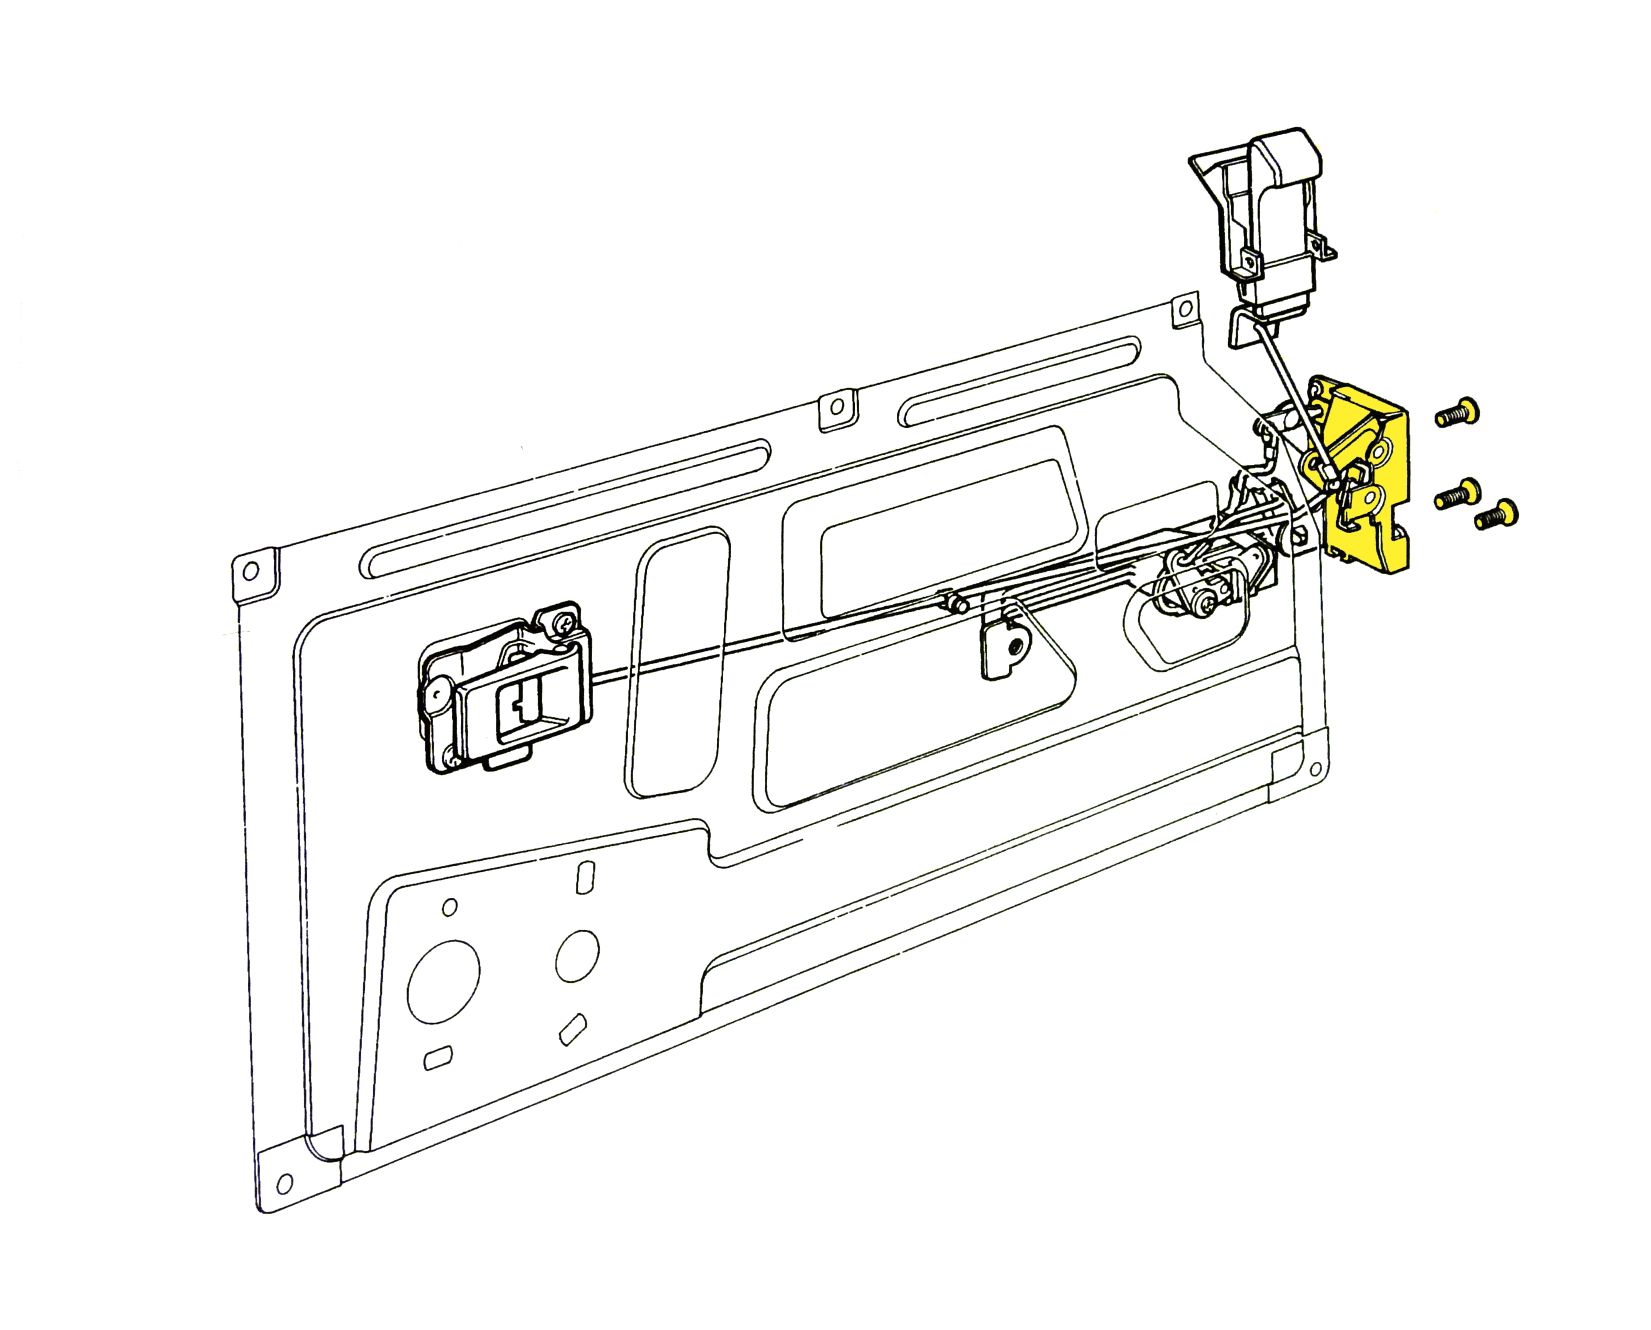 Land Rover Defender Central Locking Wiring Diagram | Wiring Diagram